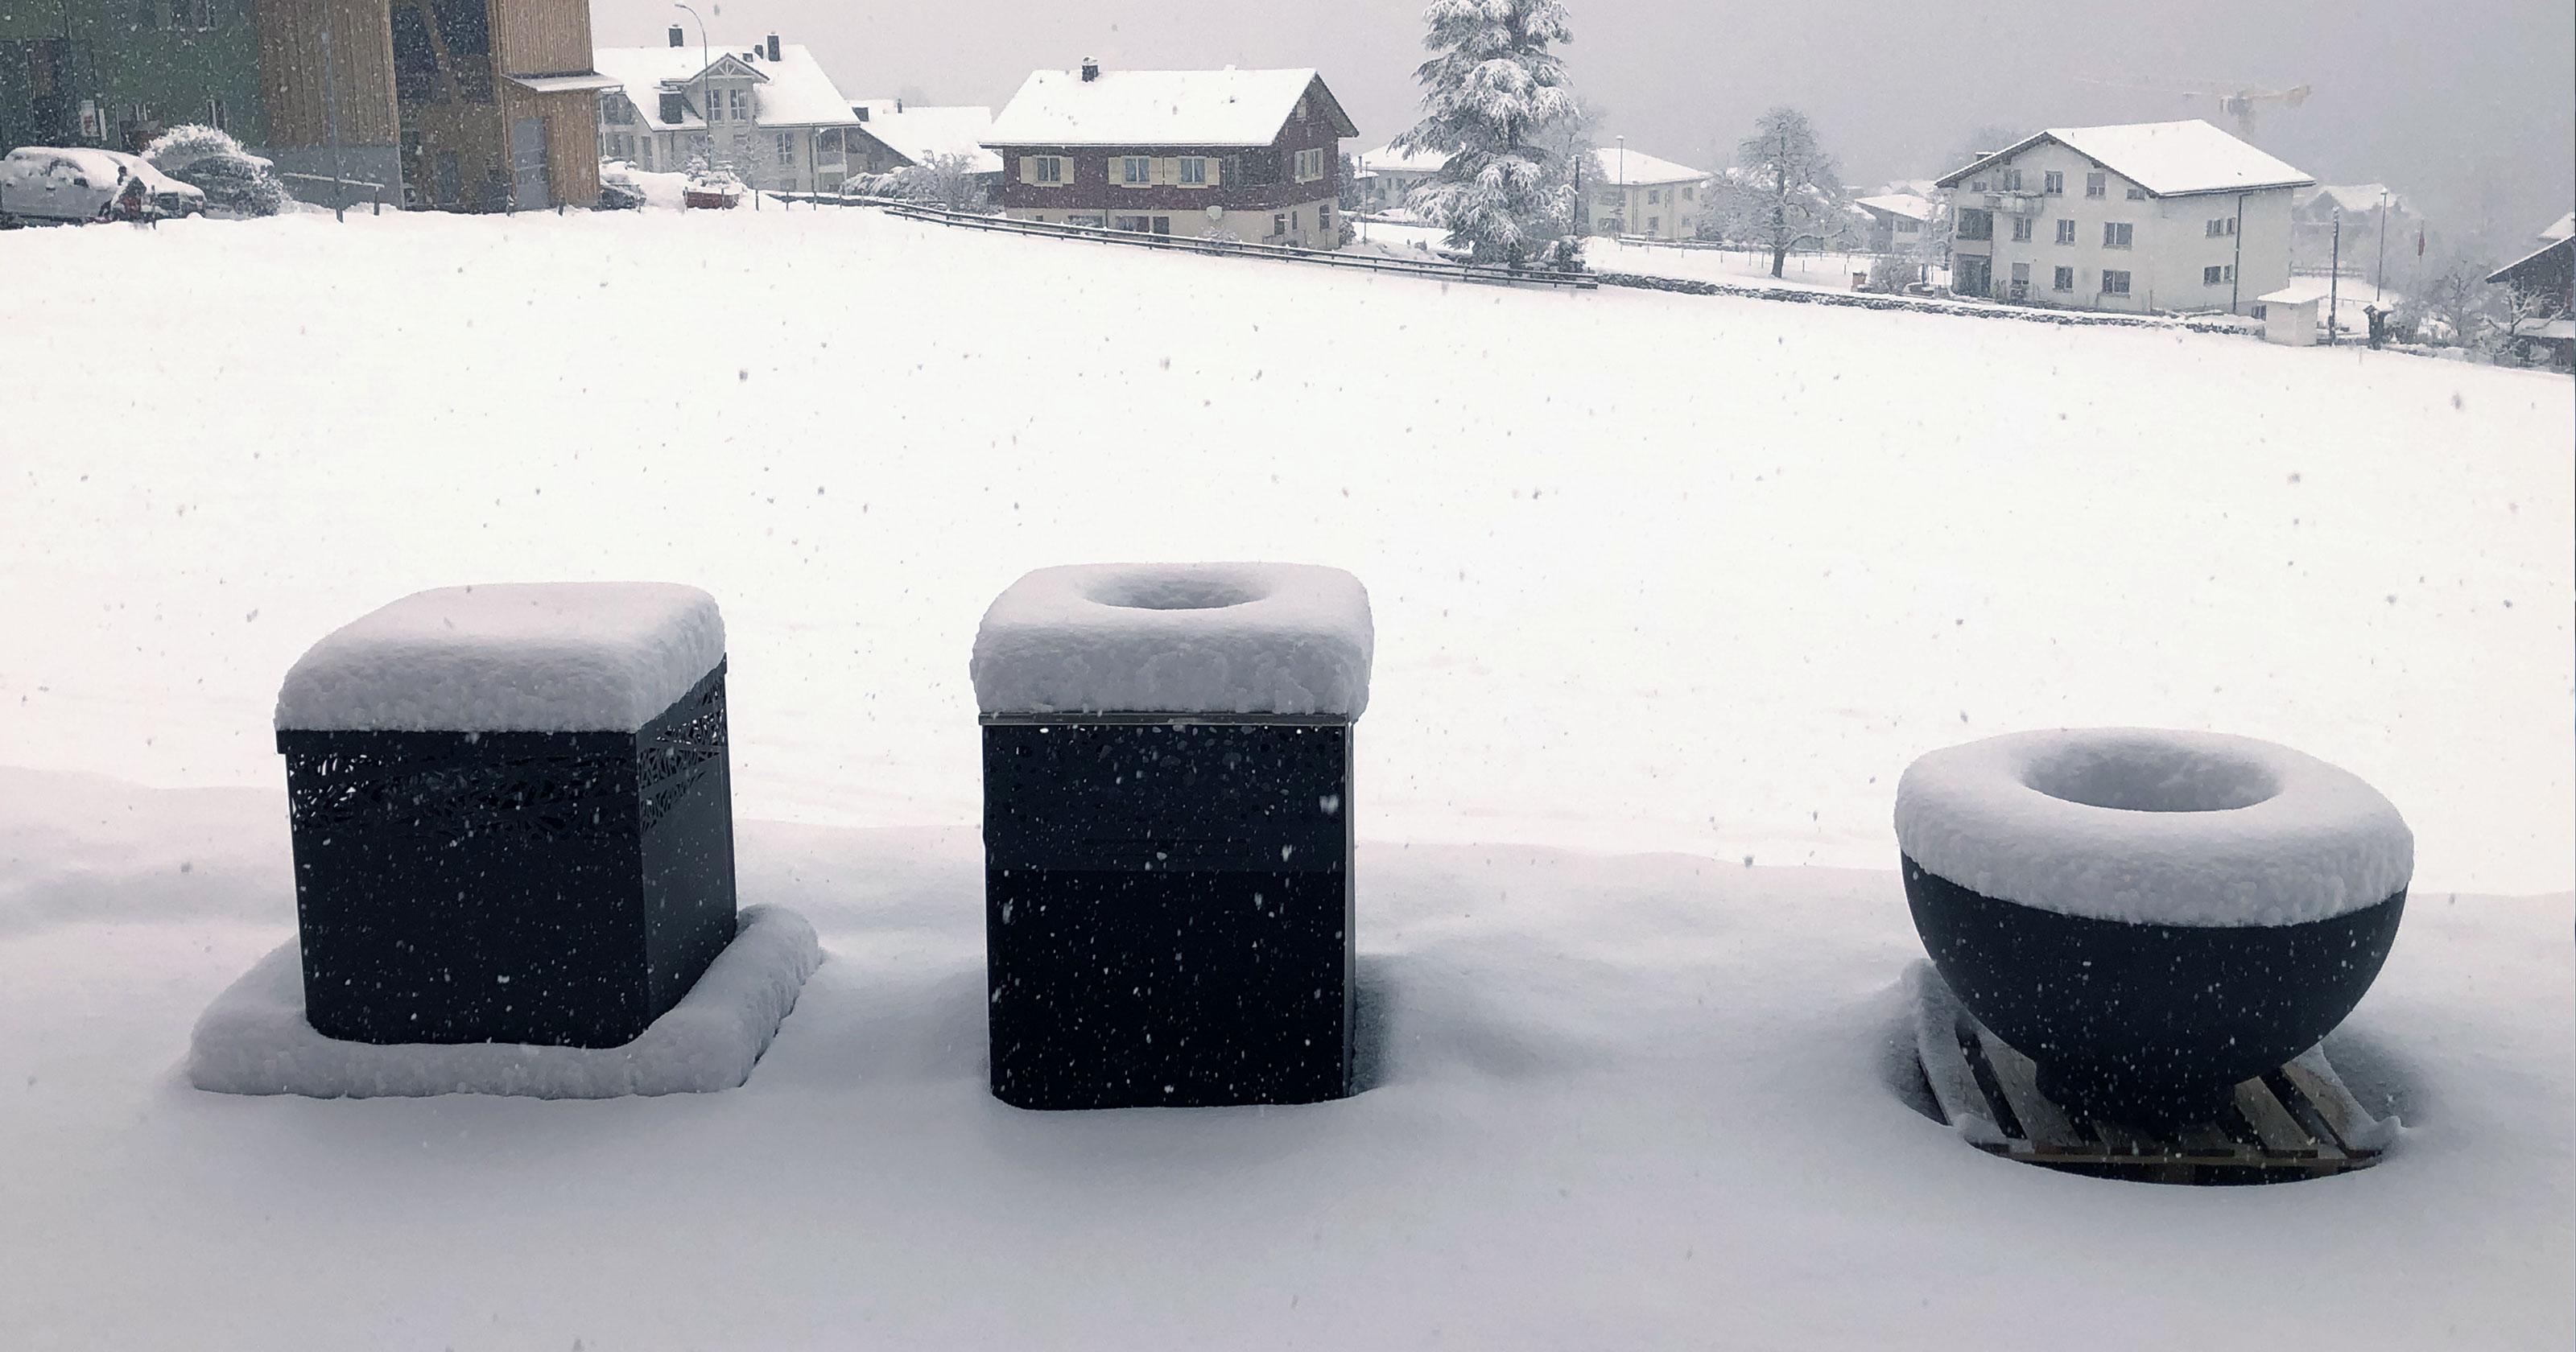 Feuerschalen im Schnee versunken